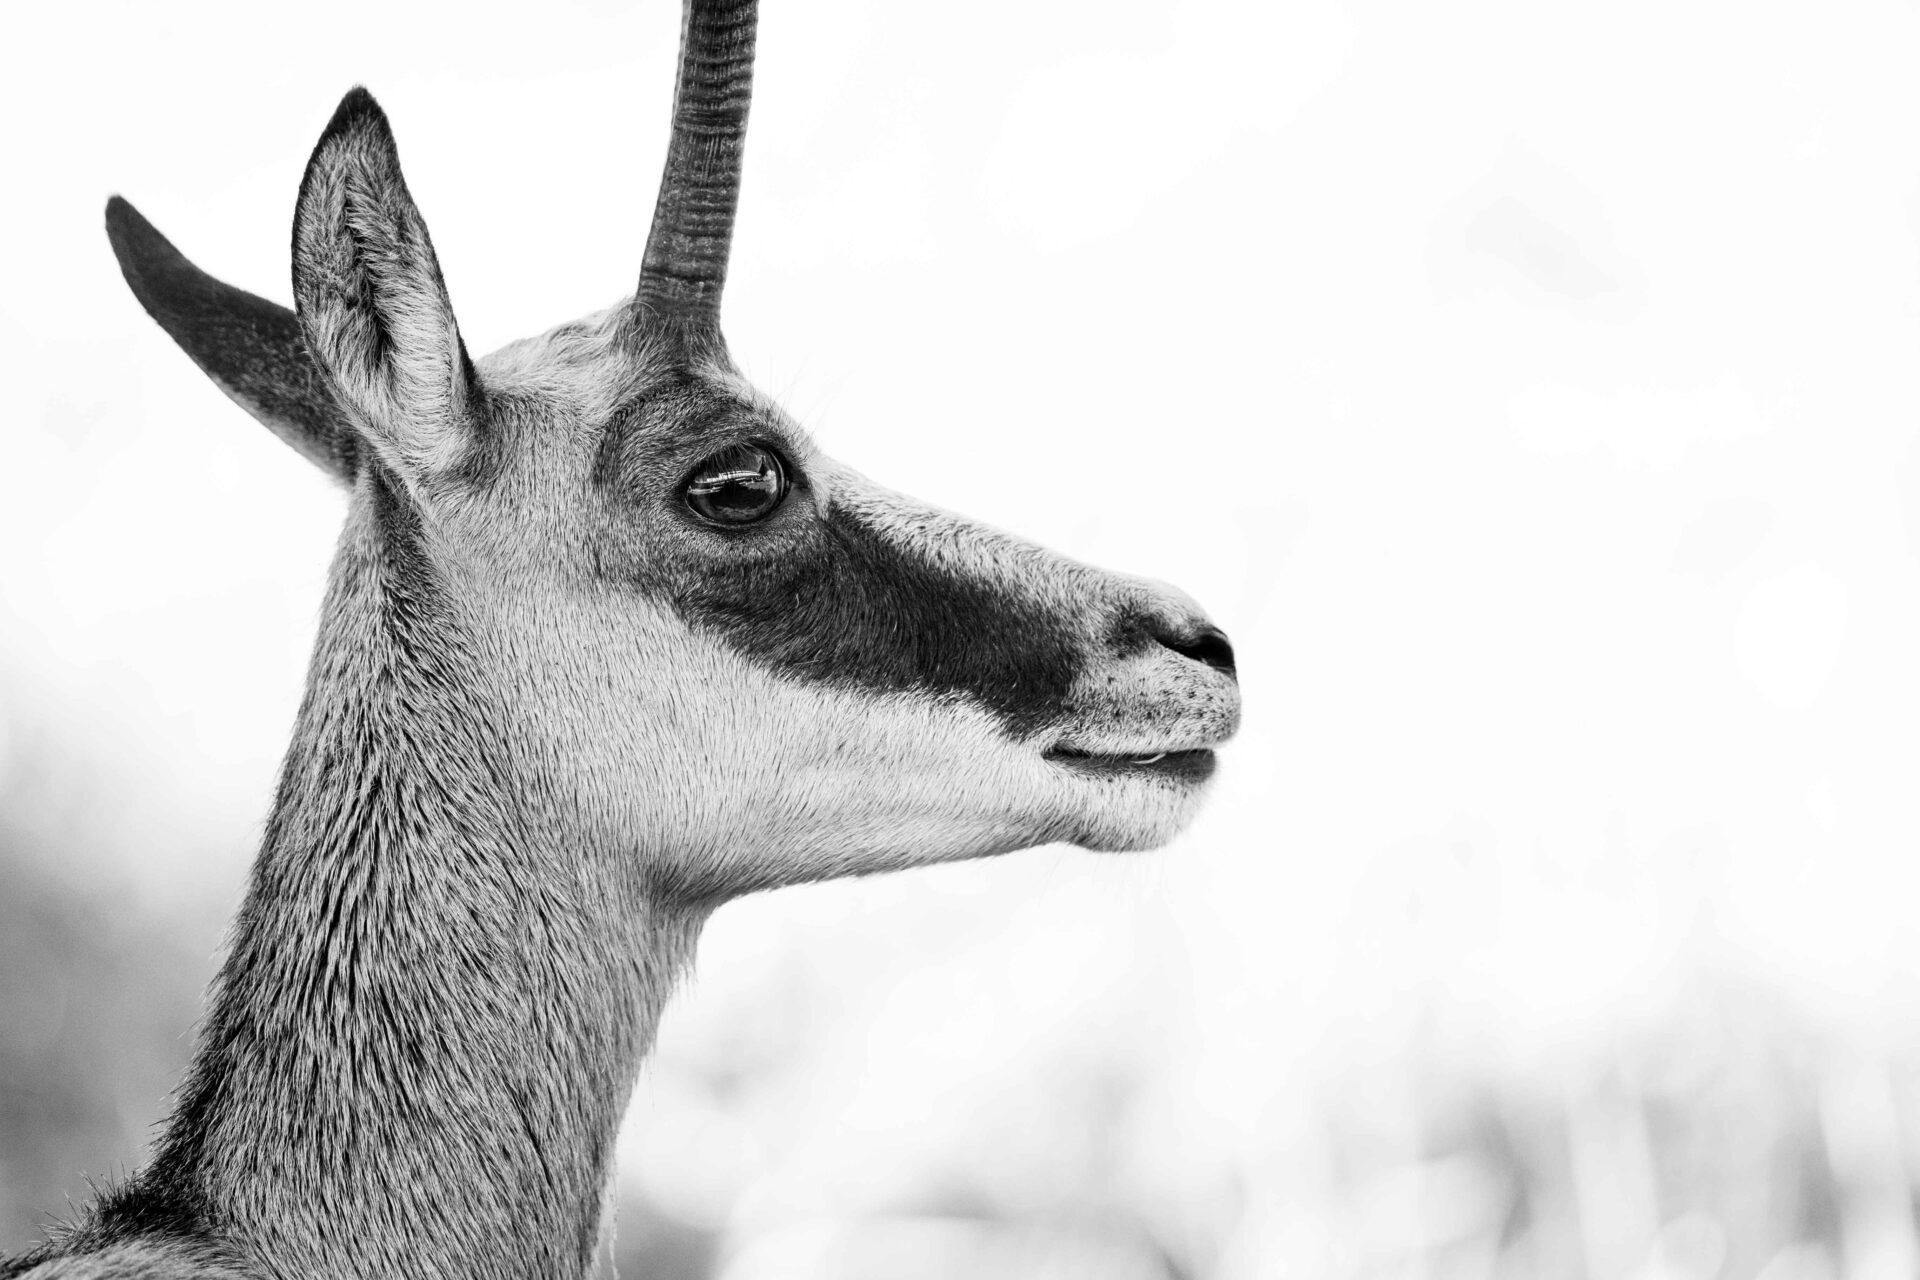 Gämse_Tierbilder_Tiere_Fotografie_Tierfotografie_3